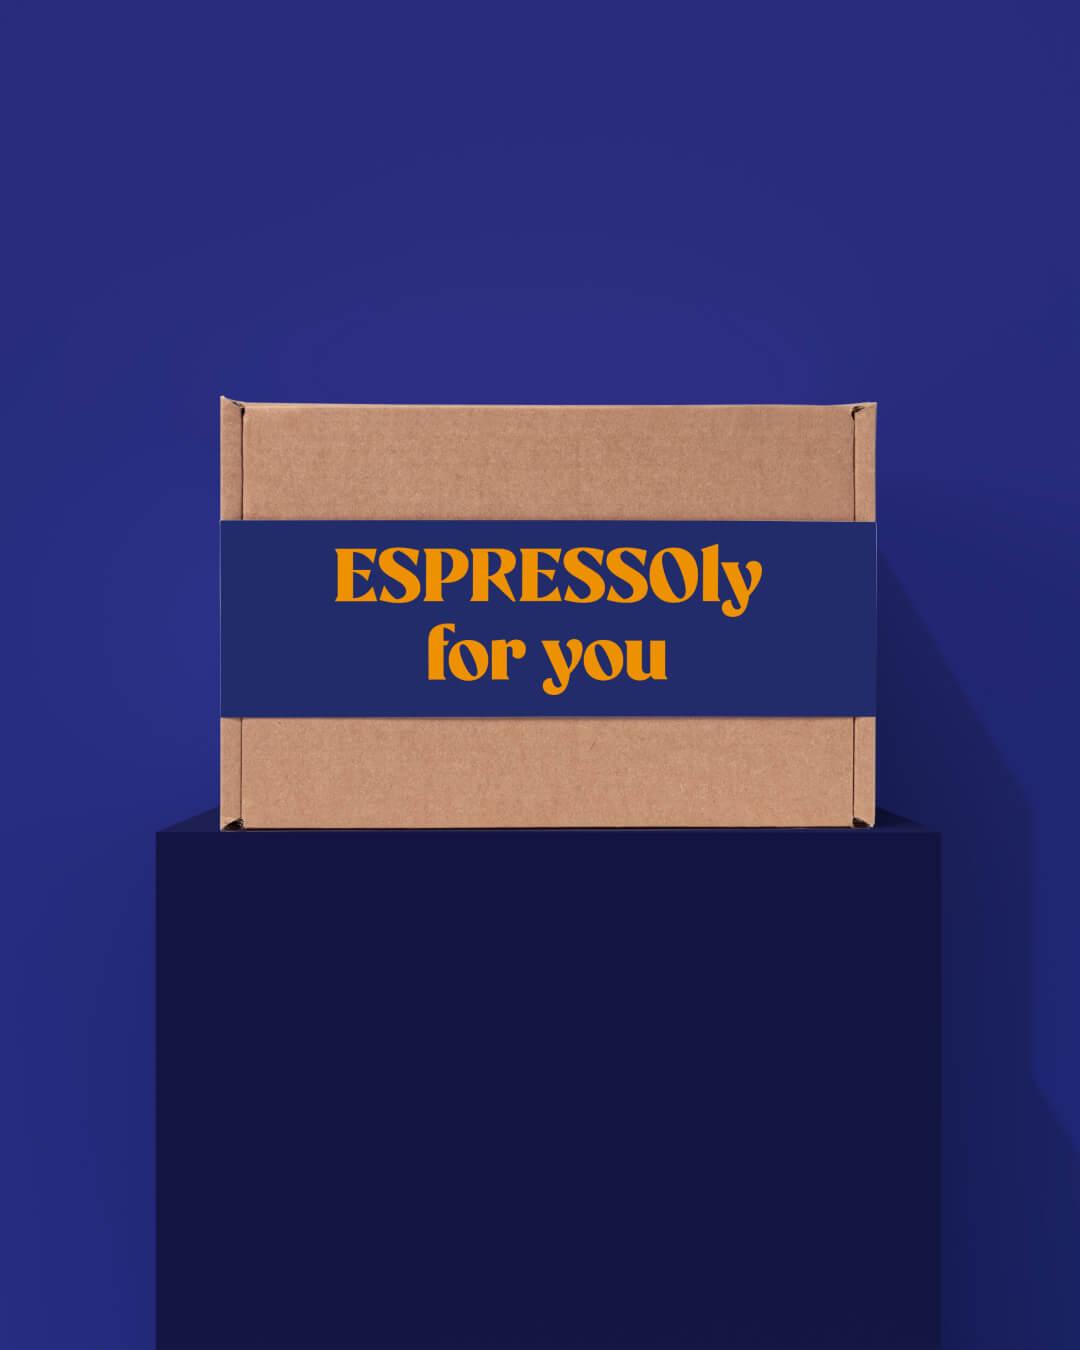 ta. coffee box packaging